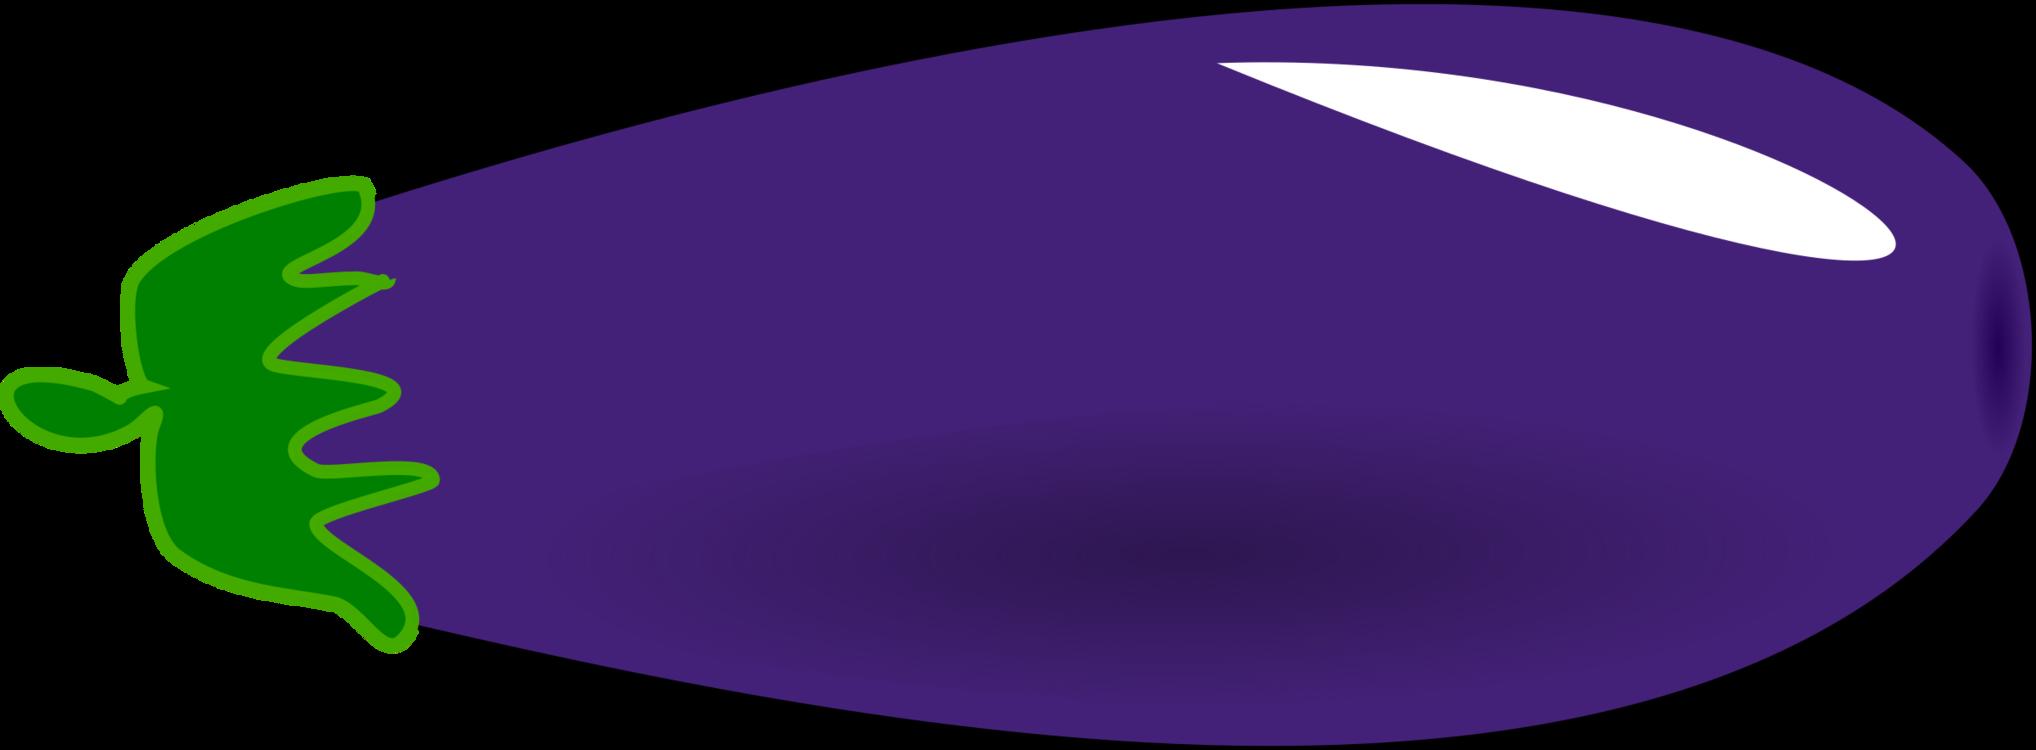 Leaf,Purple,Green